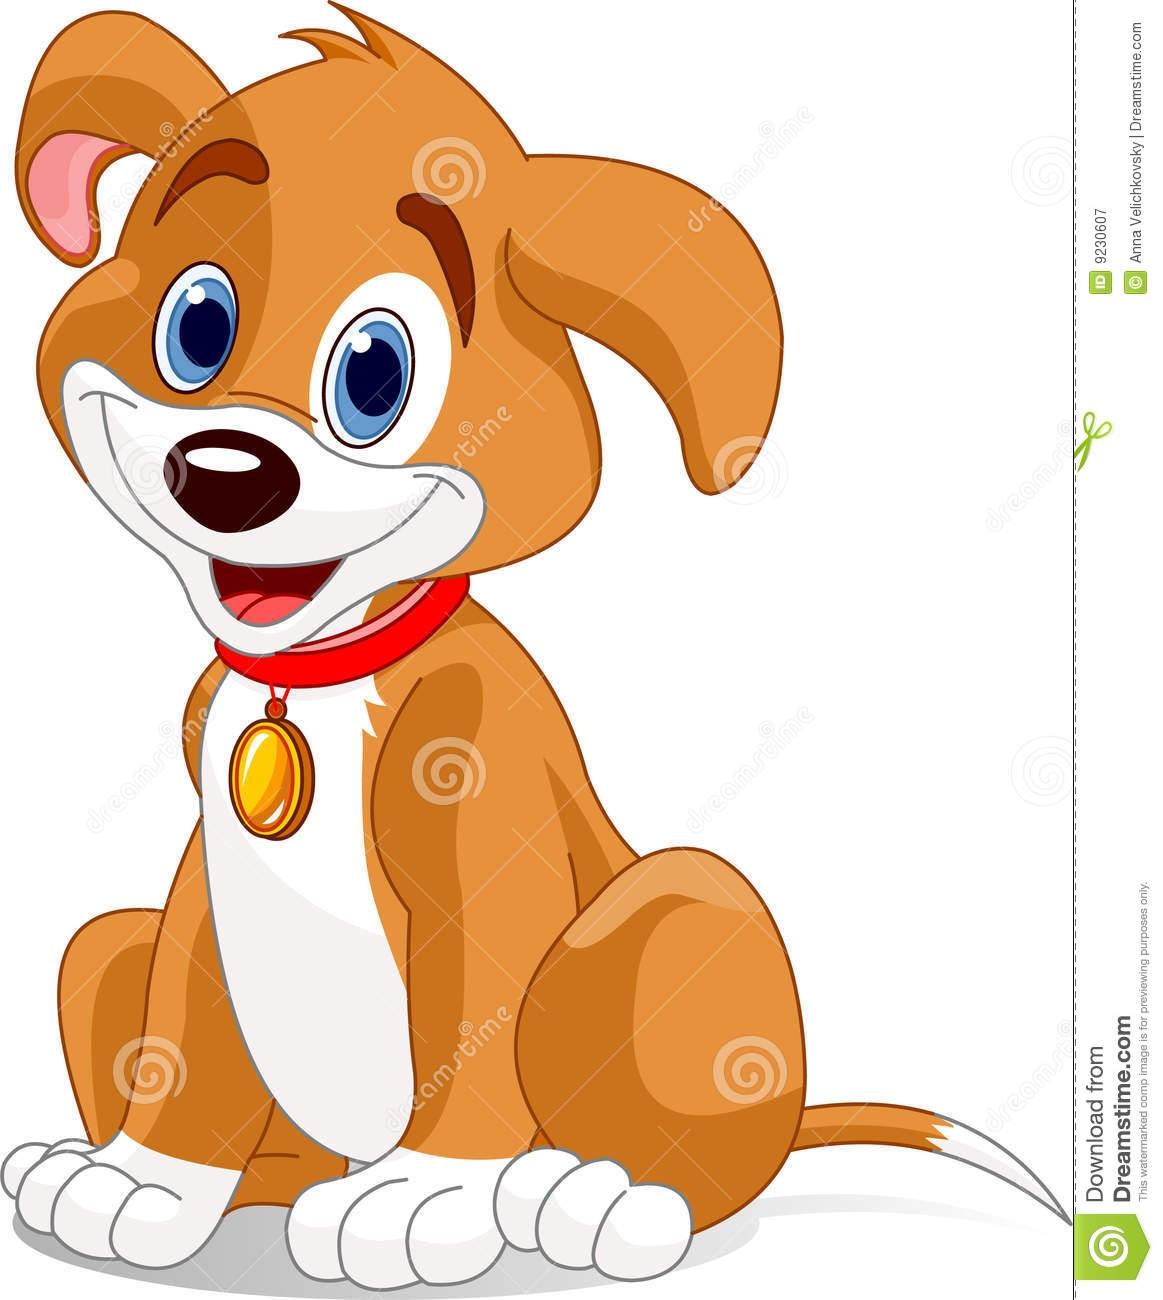 Cute dogs clipart - ClipartFox